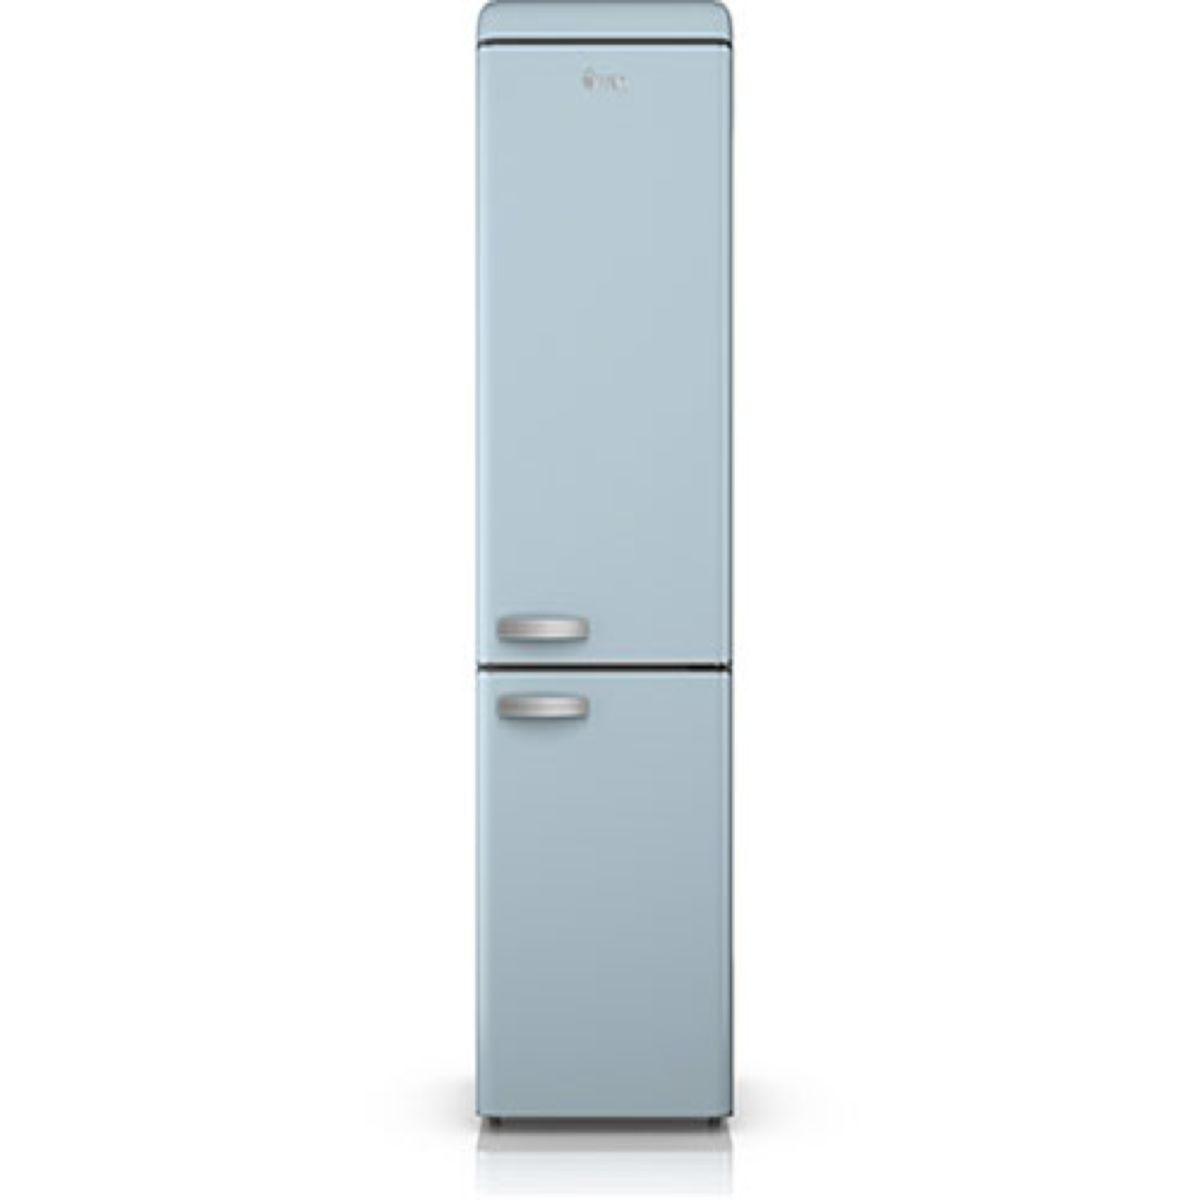 Swan SR11020BLN Retro Fridge Freezer - Blue